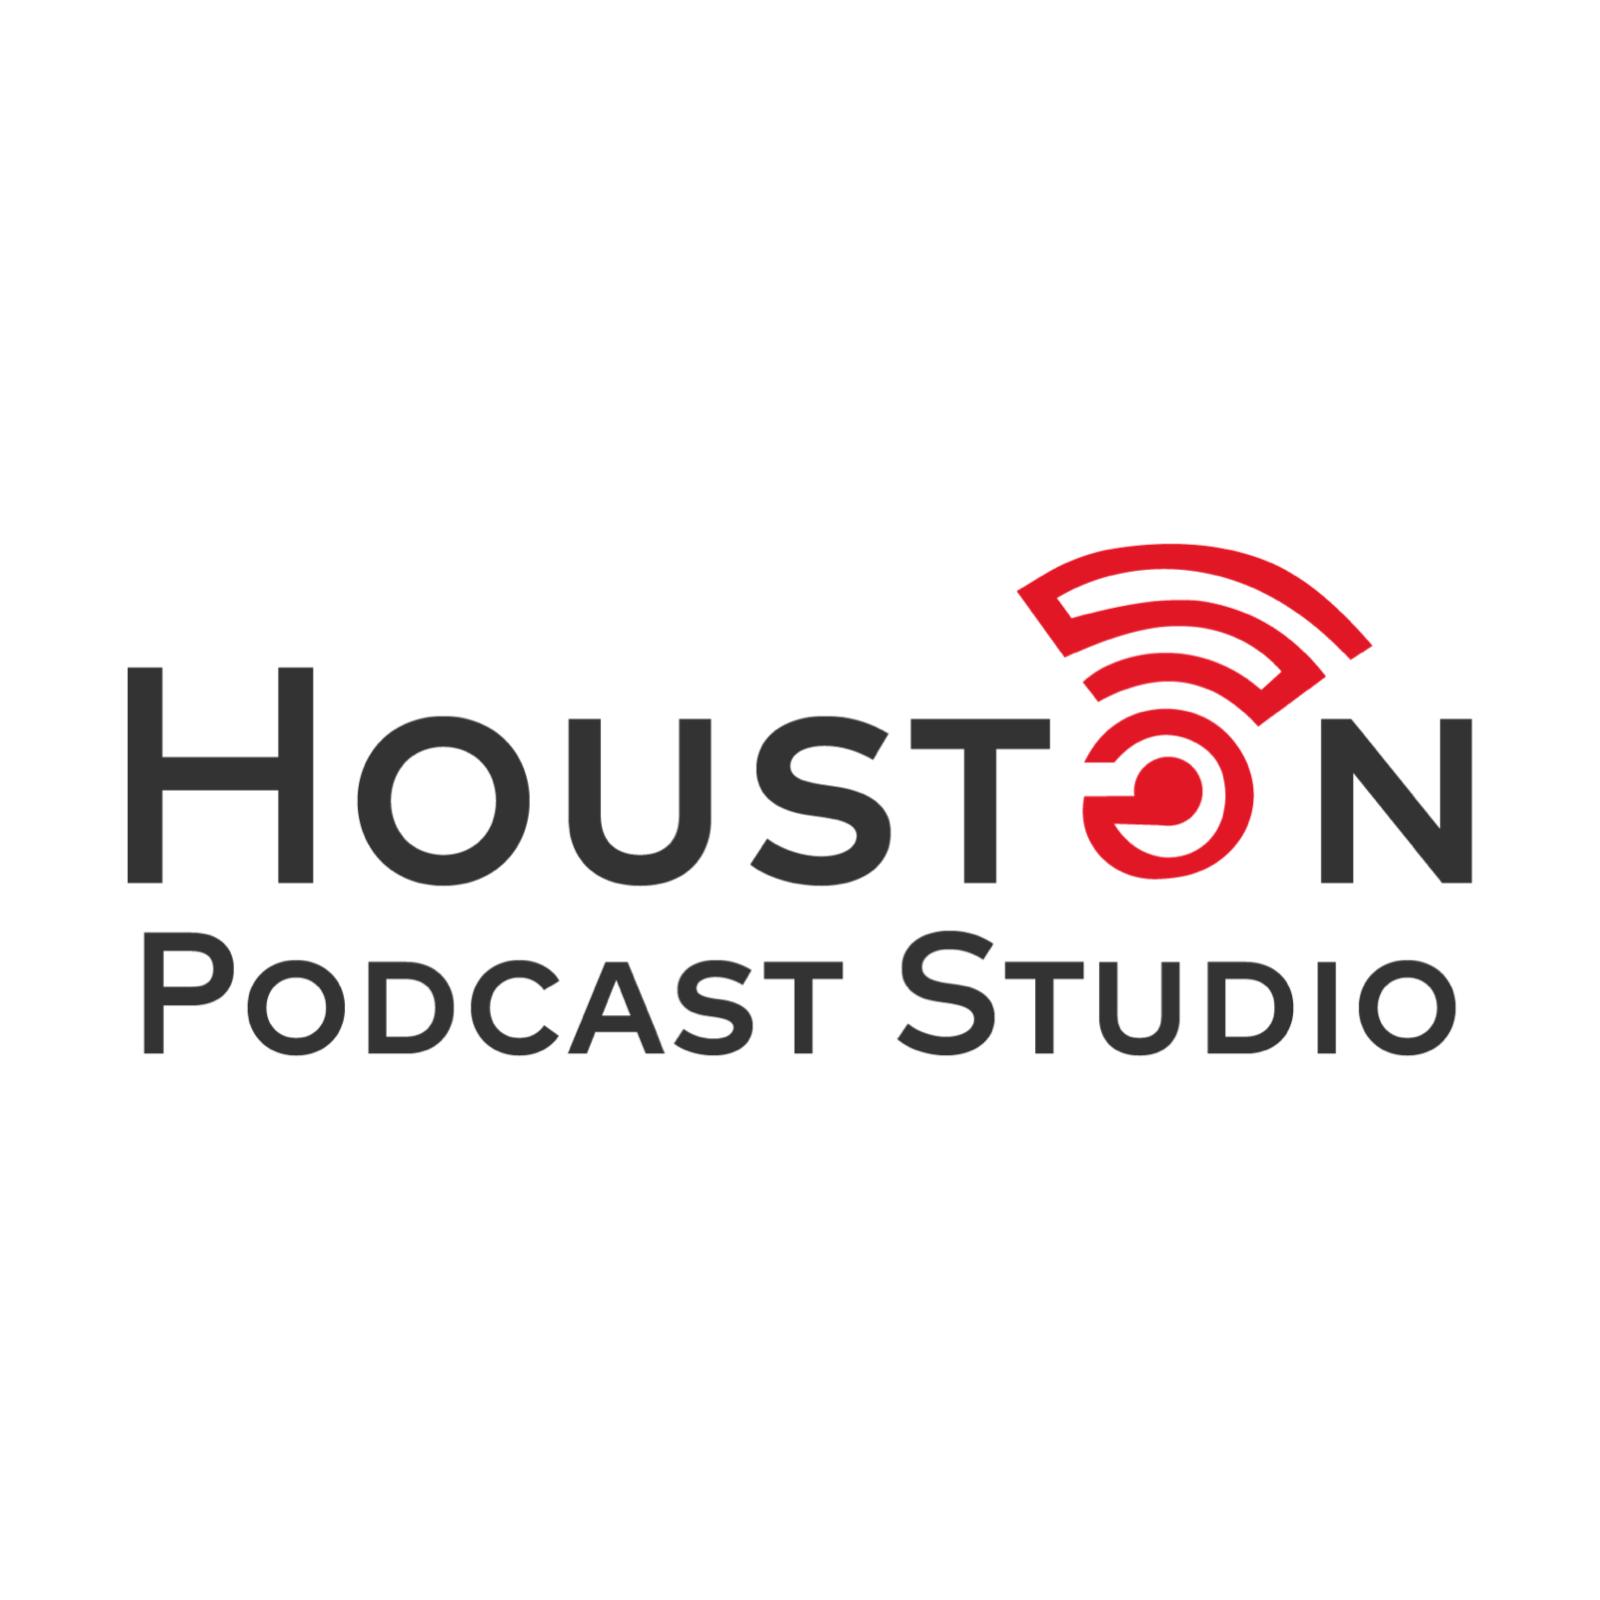 Houston Podcast Studio